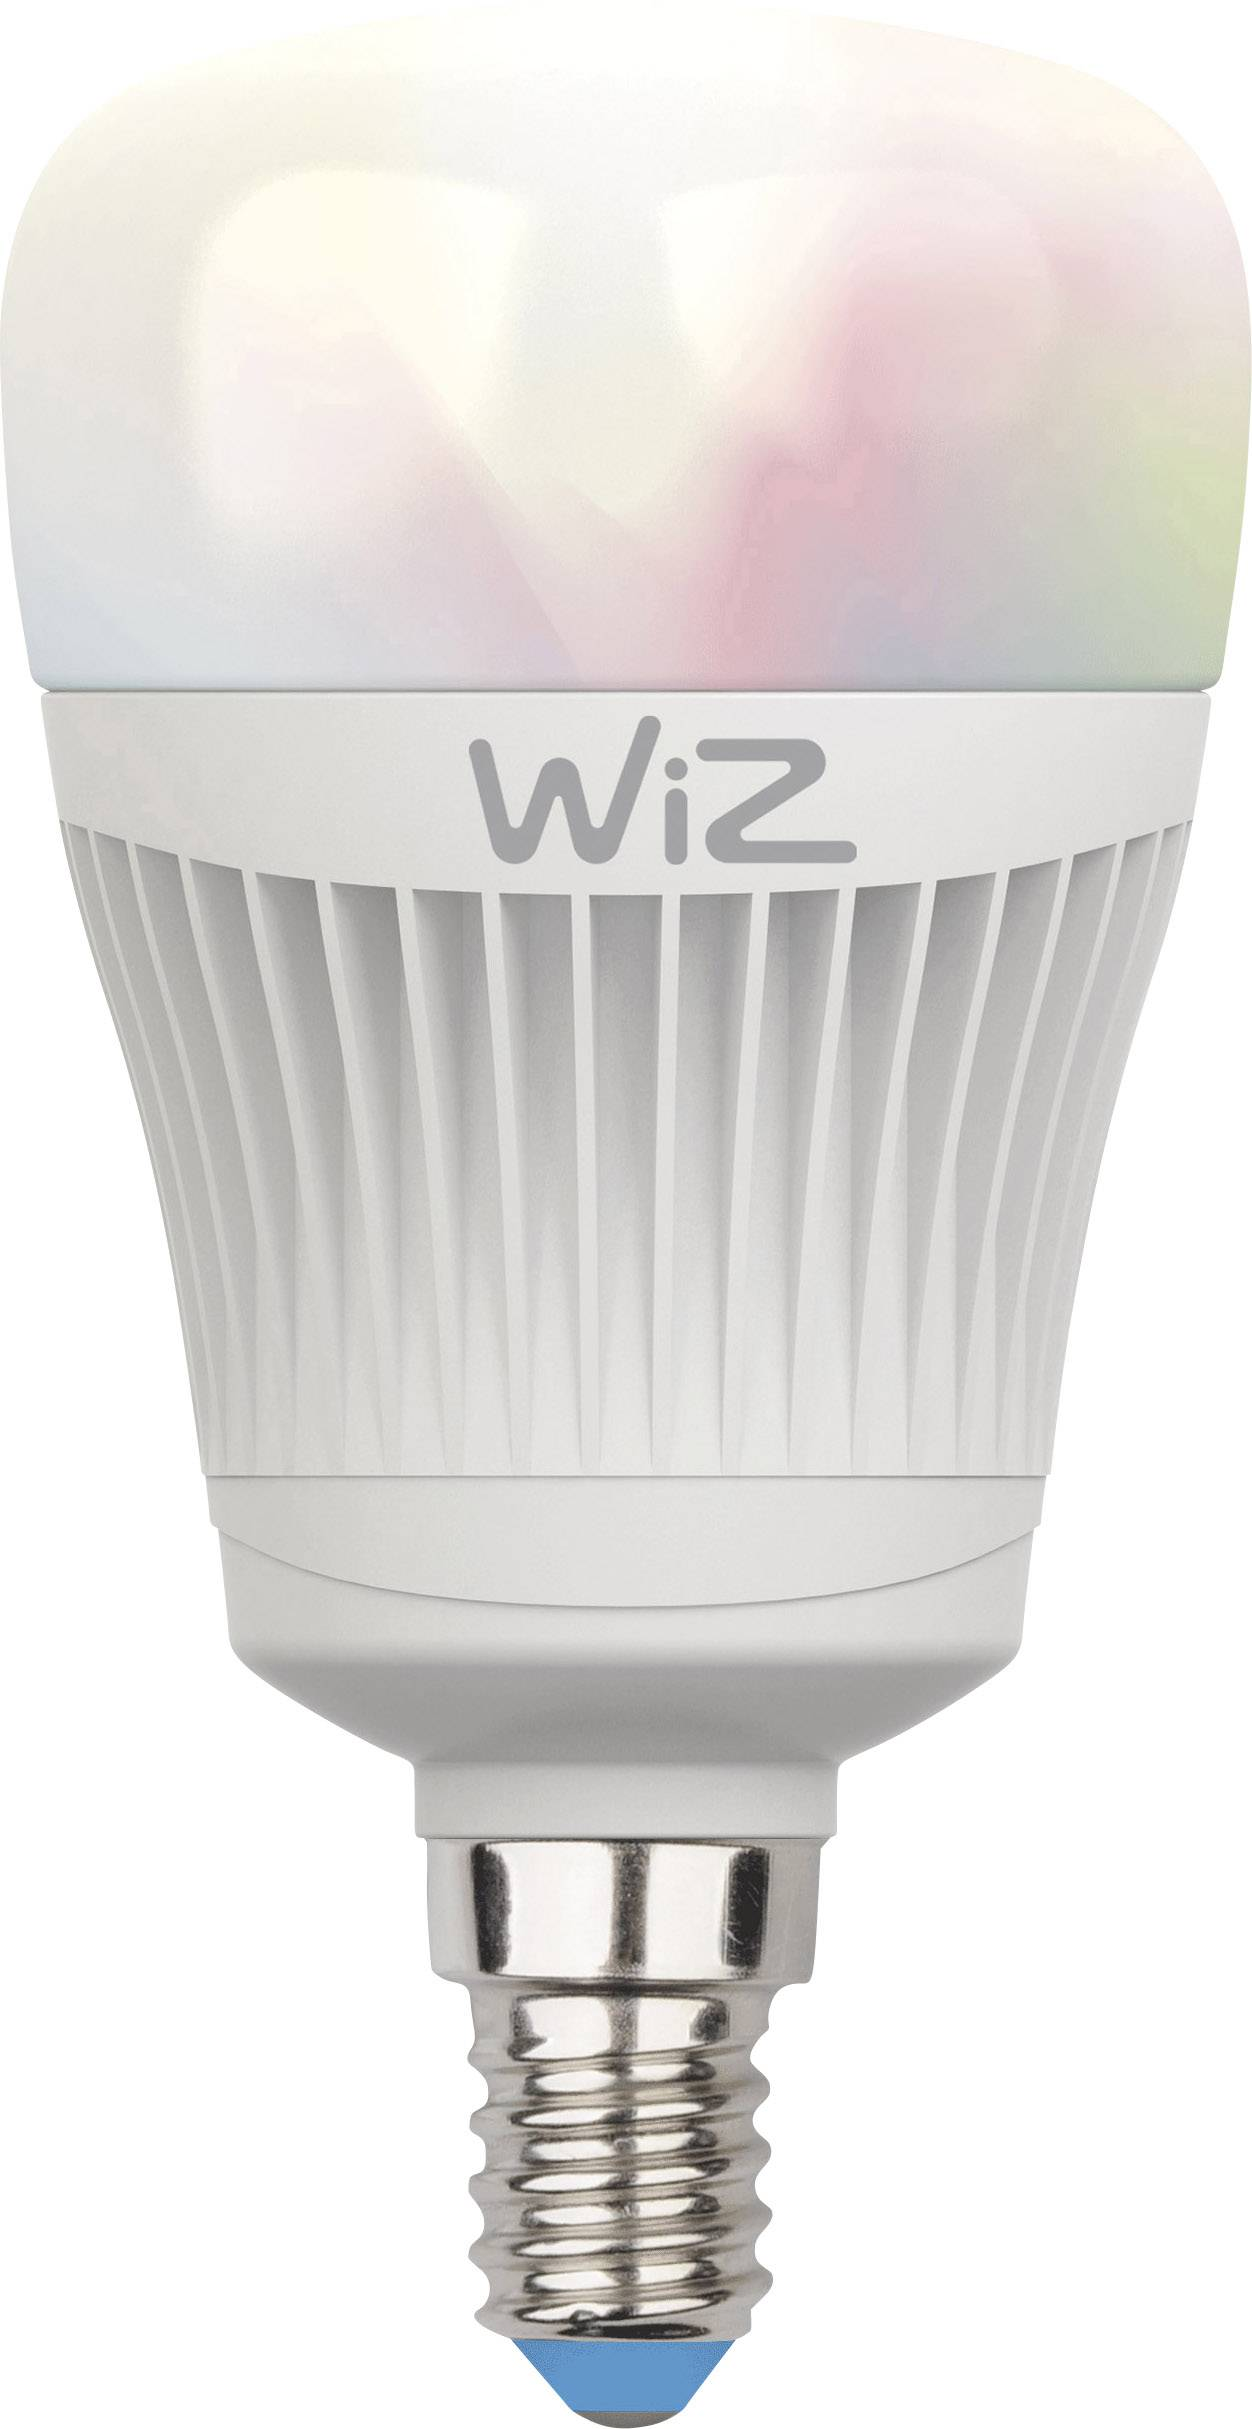 Aanbieding Led Lampen : Aanbieding wiz colours a e led lamp wiz met korting